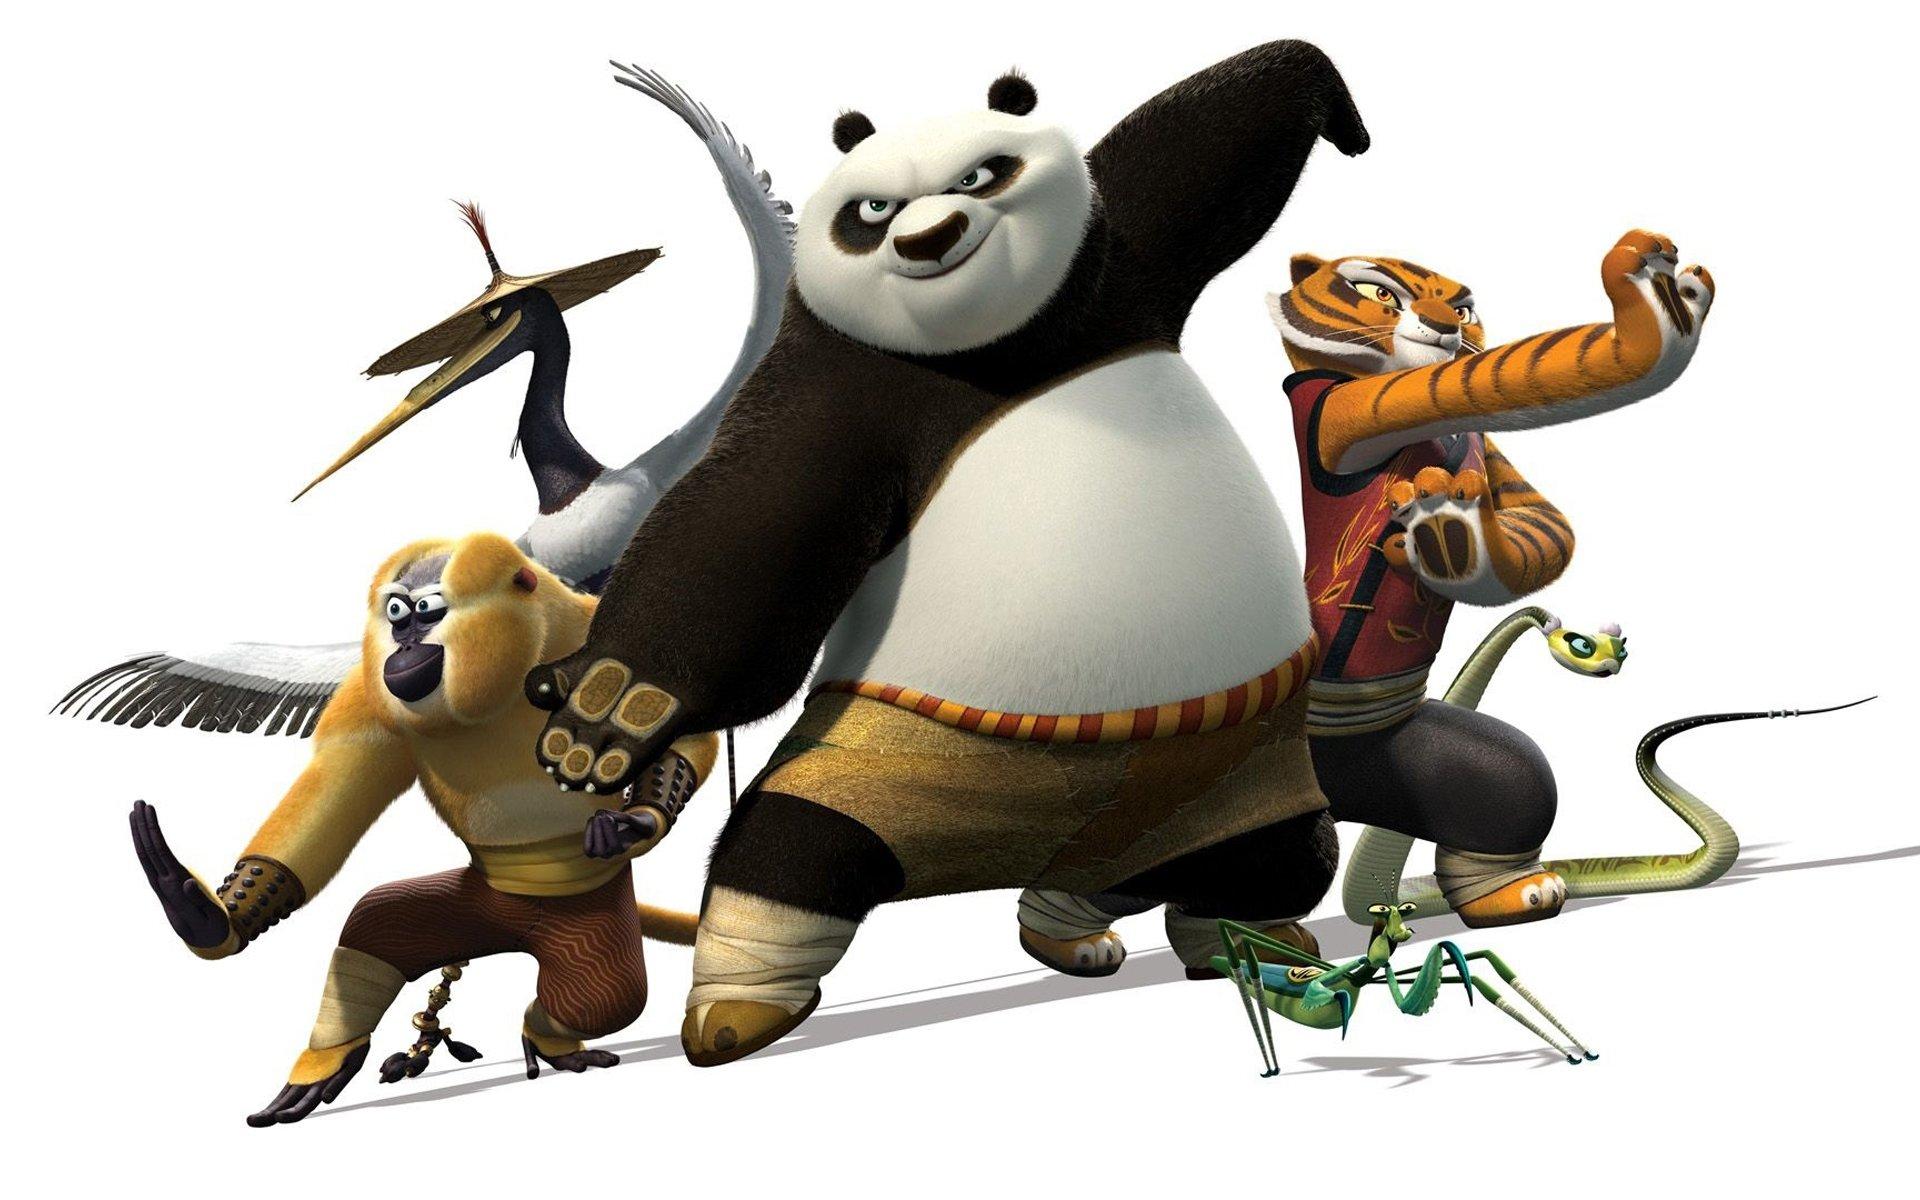 kung fu panda full hd wallpaper and background image | 1920x1200